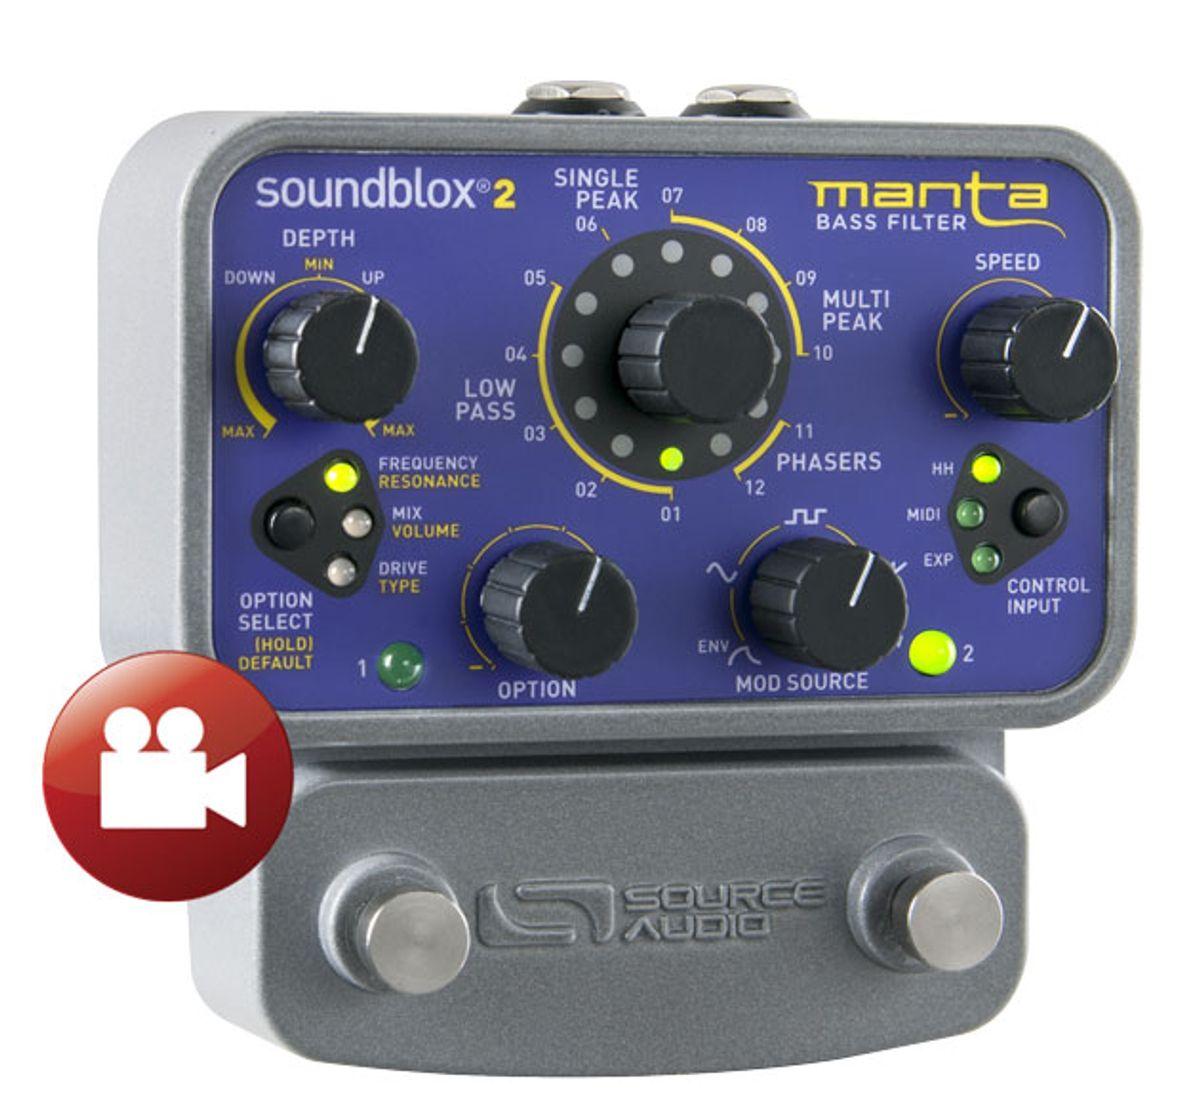 Source Audio Manta Bass Filter Review